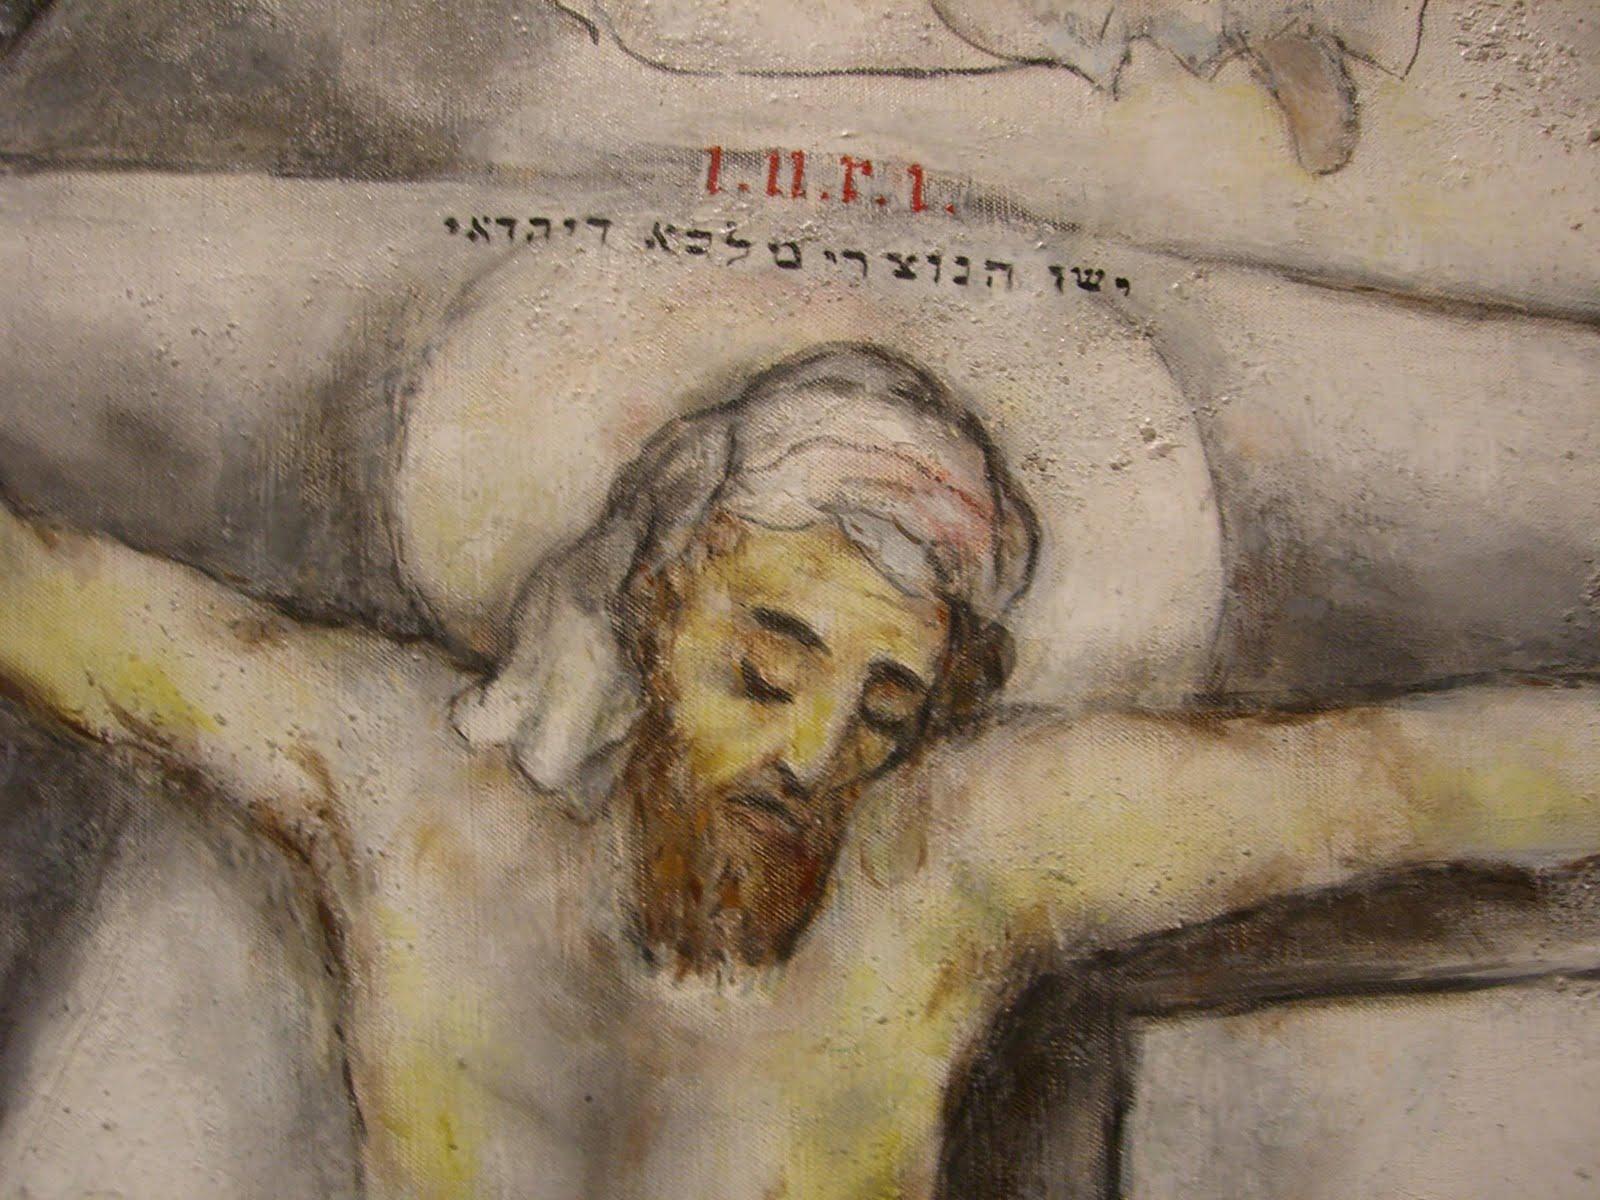 chantblog: April 2011 Marc Chagall White Crucifixion Poem